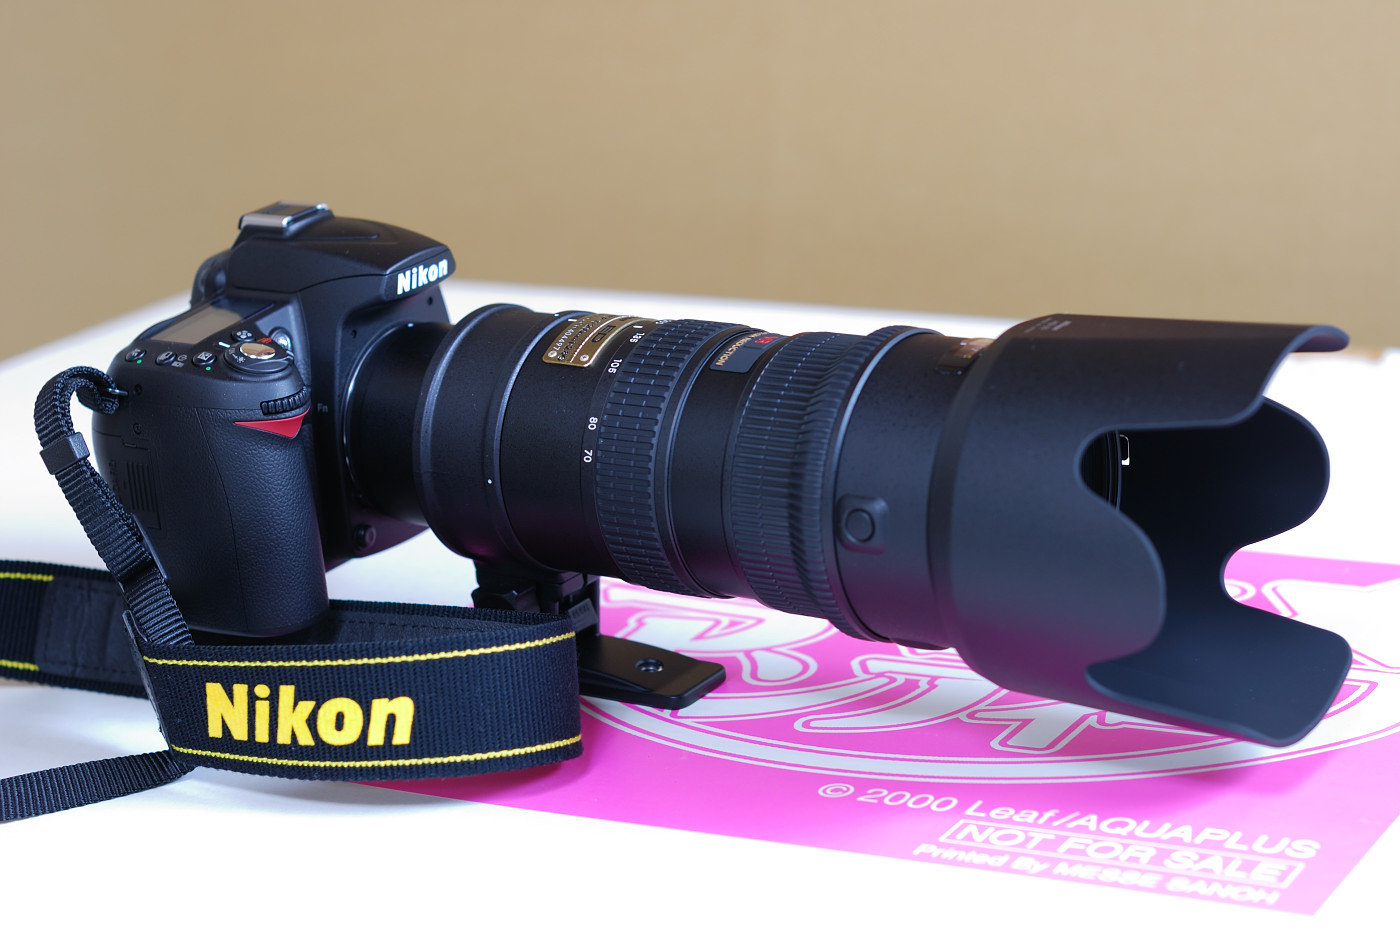 Nikon D90とAF-S VR Zoom-Nikkor ED 70-200mm F2.8G(IF)